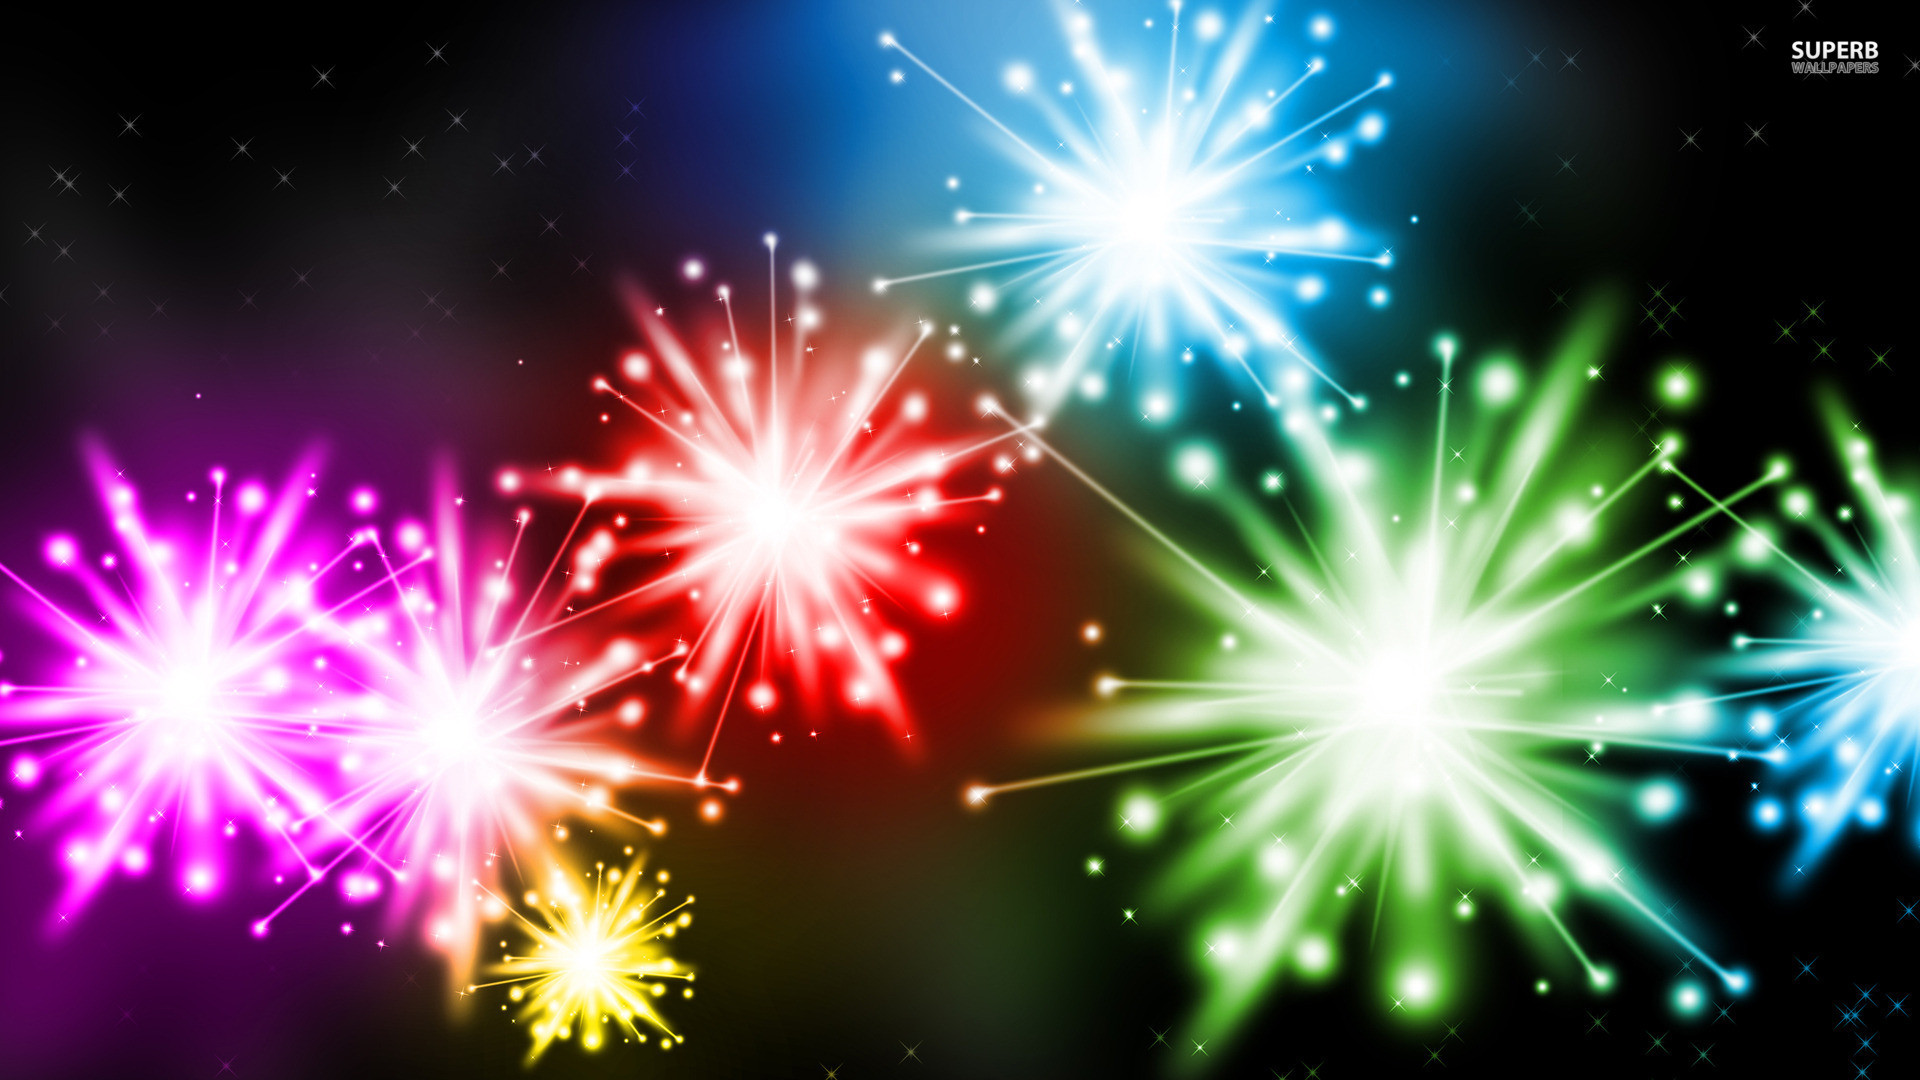 Fireworks Background - WallpaperSafari